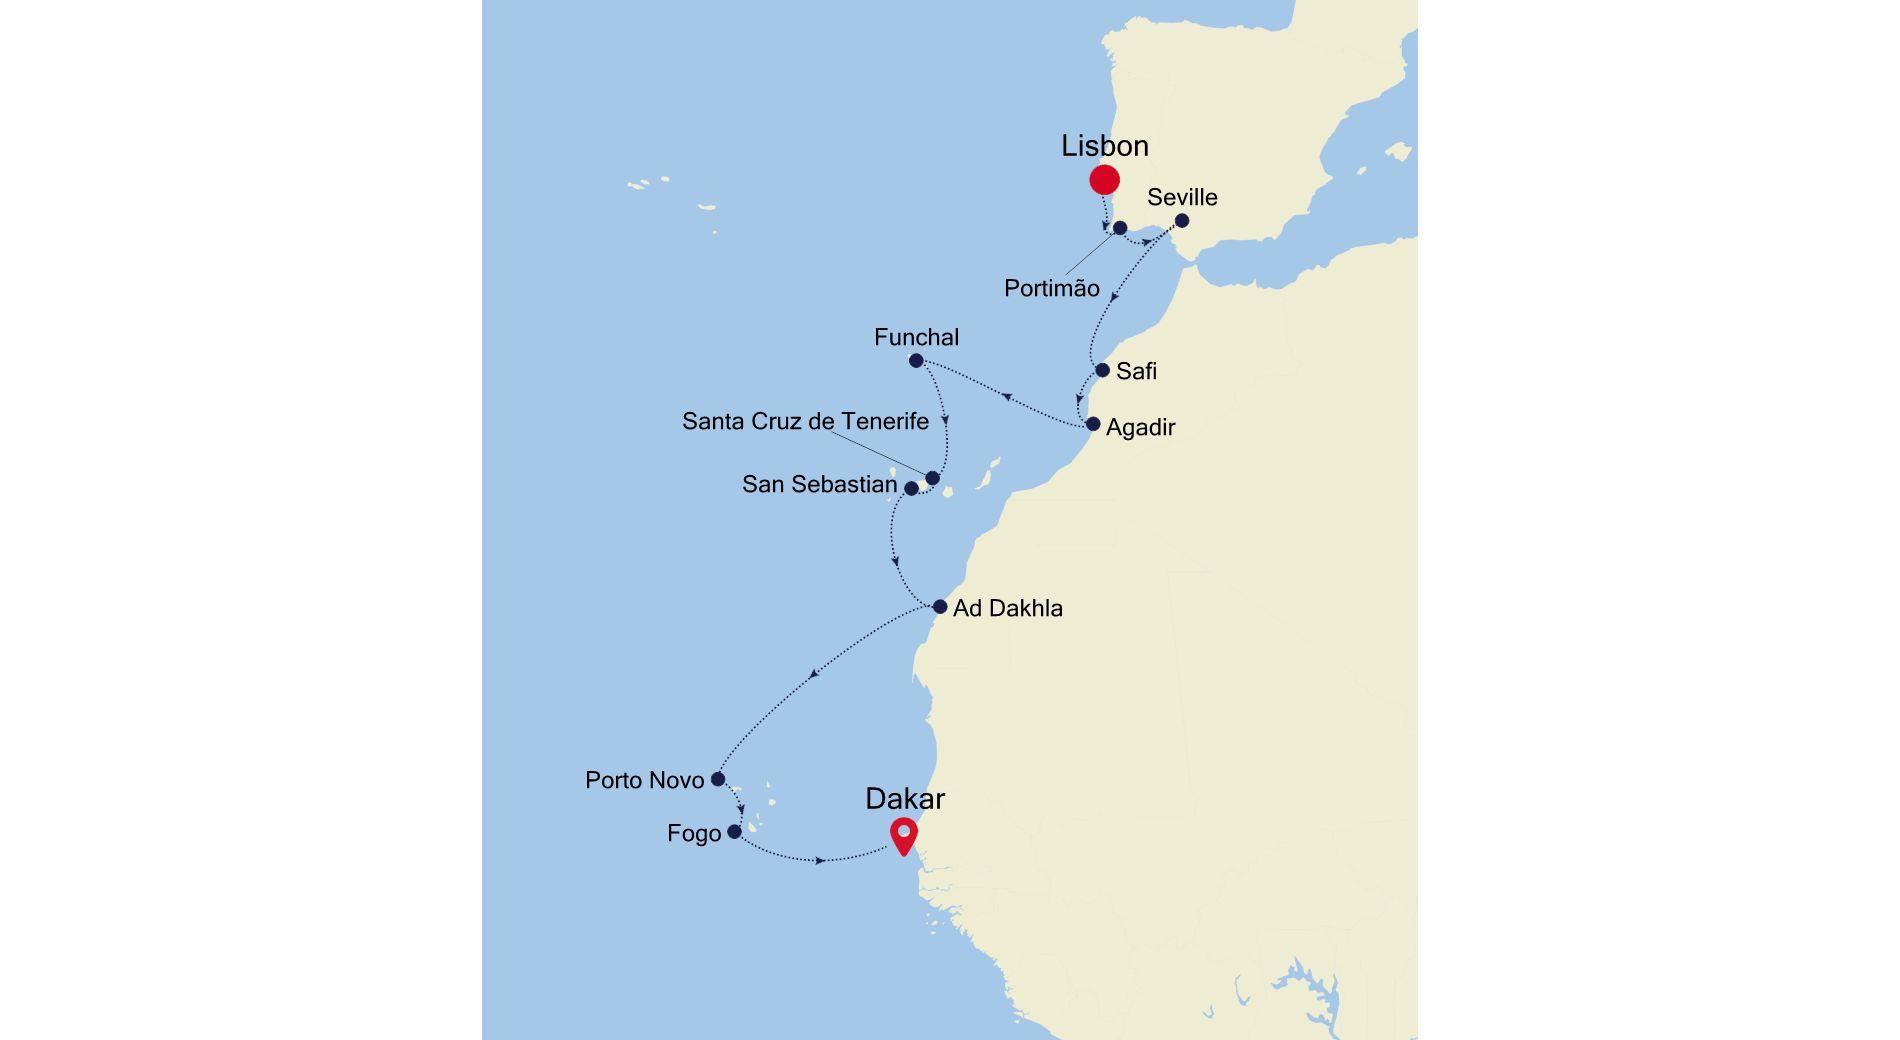 WI211012017 - Lisbon to Dakar